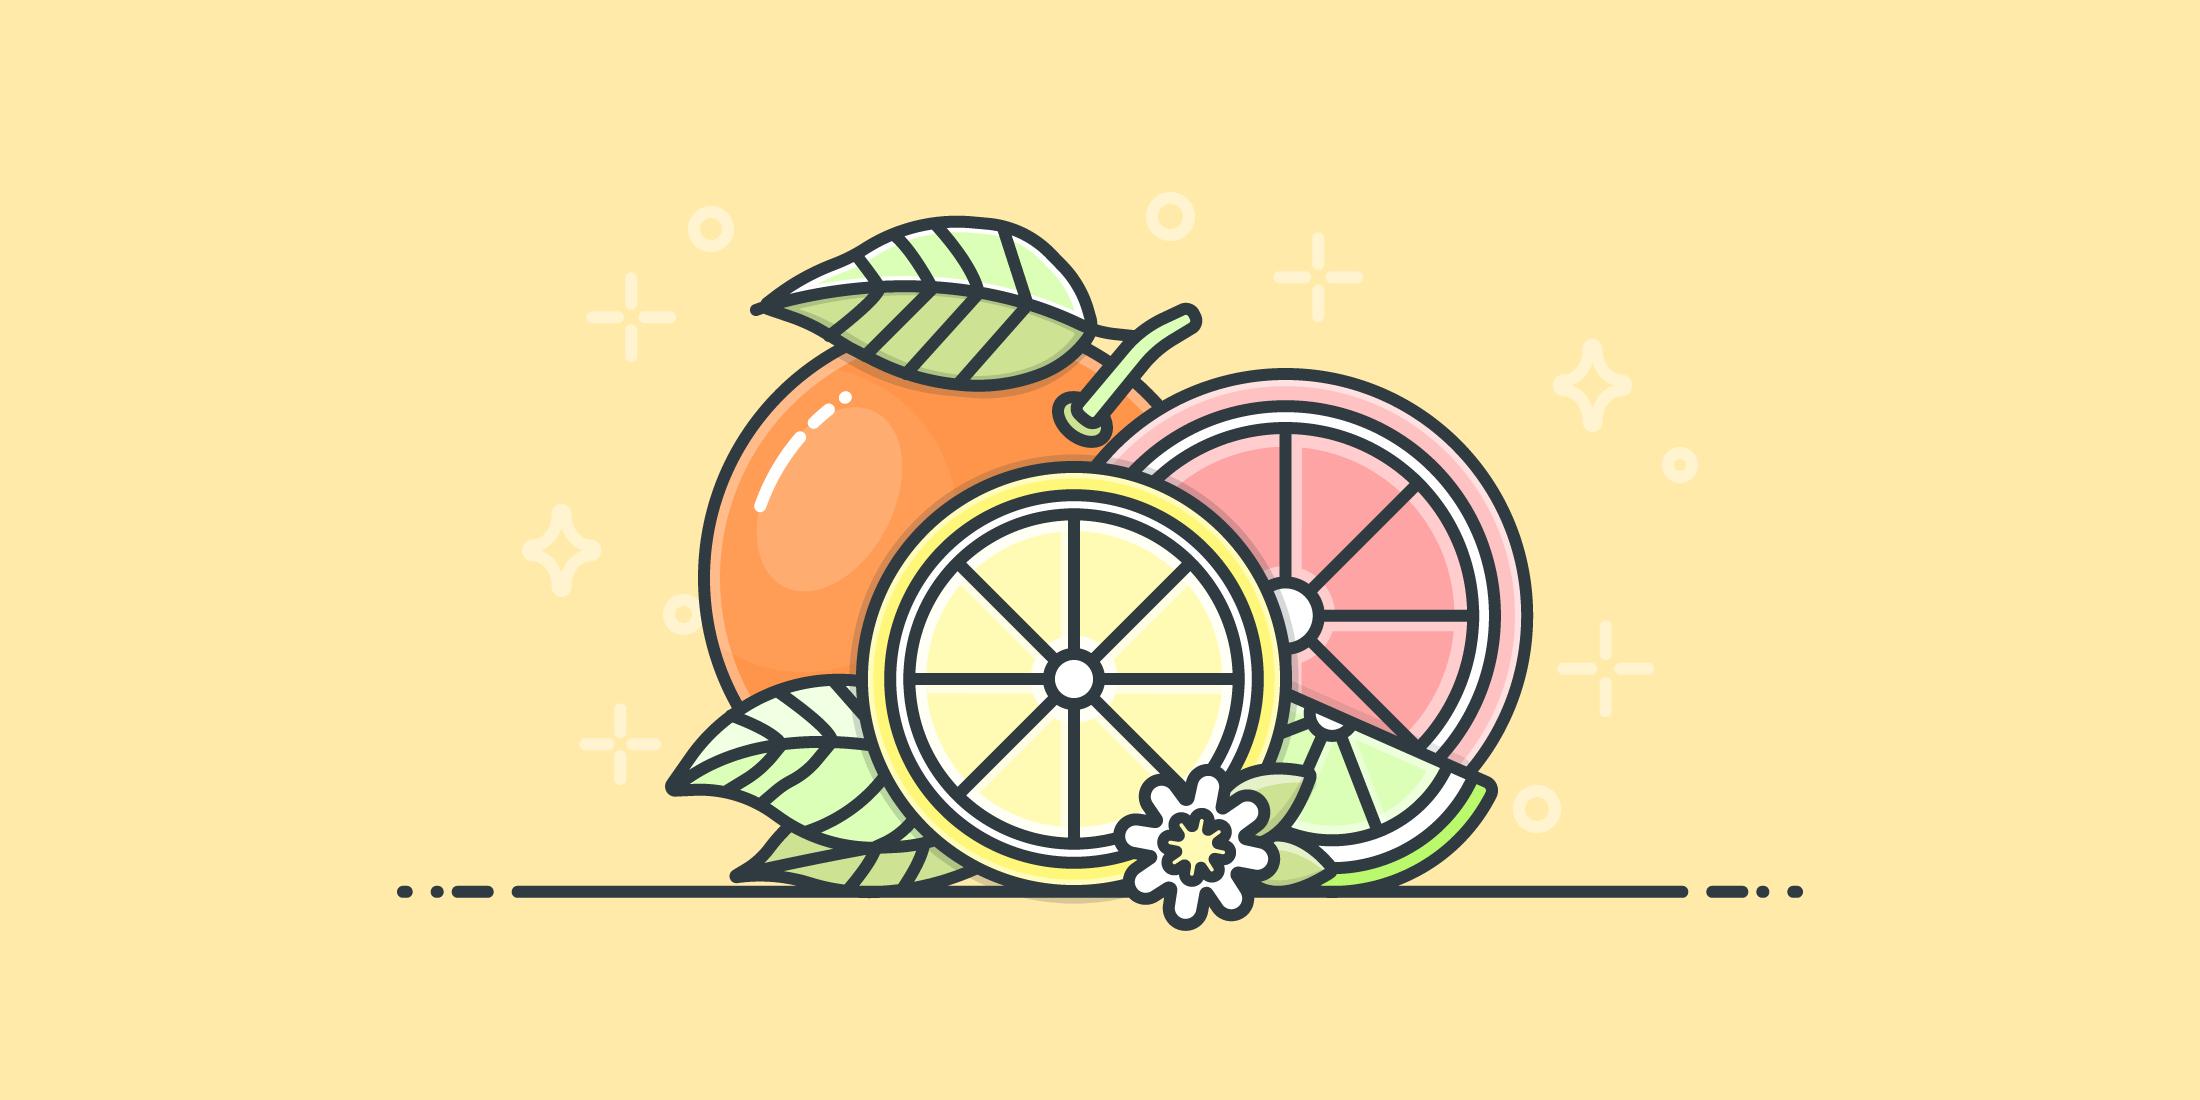 Illustration of citrus fruits